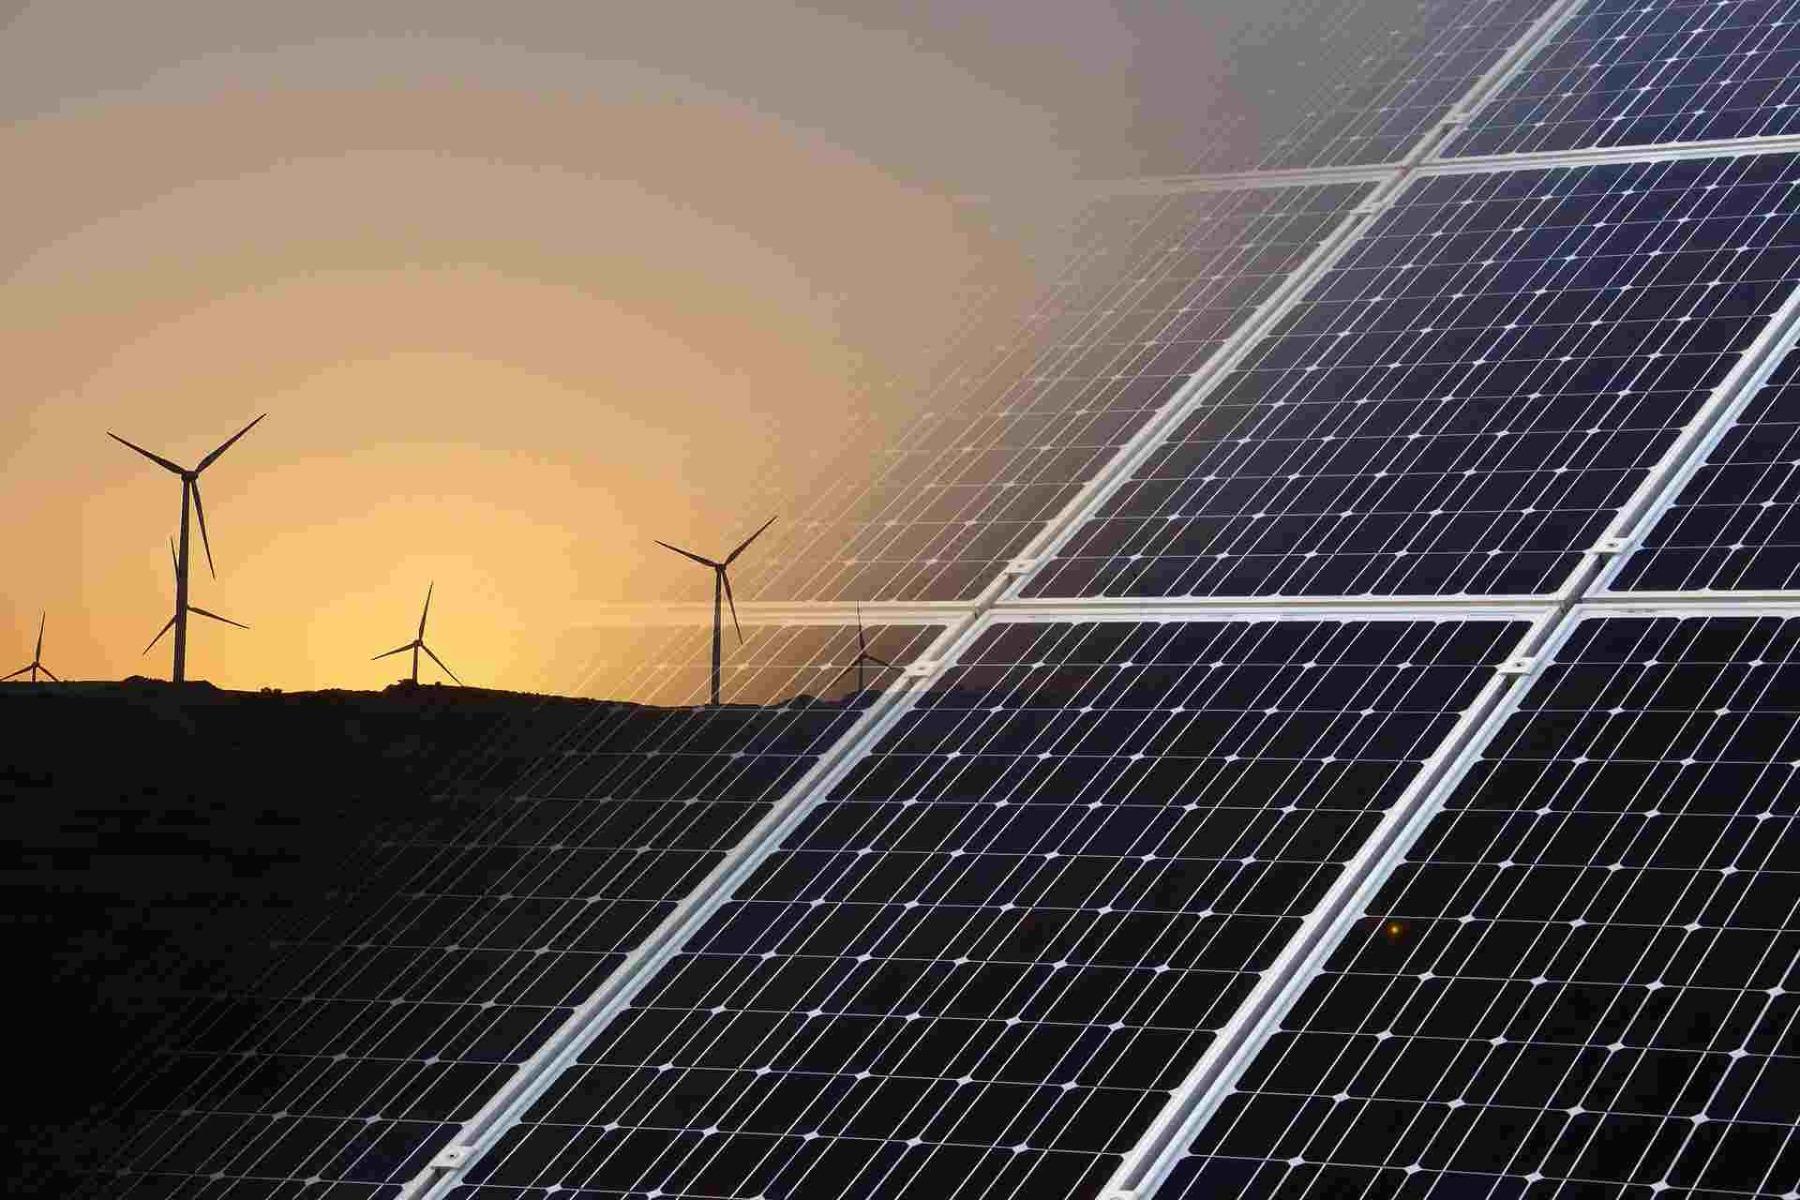 Solar Panel & Wind Turbine Cable